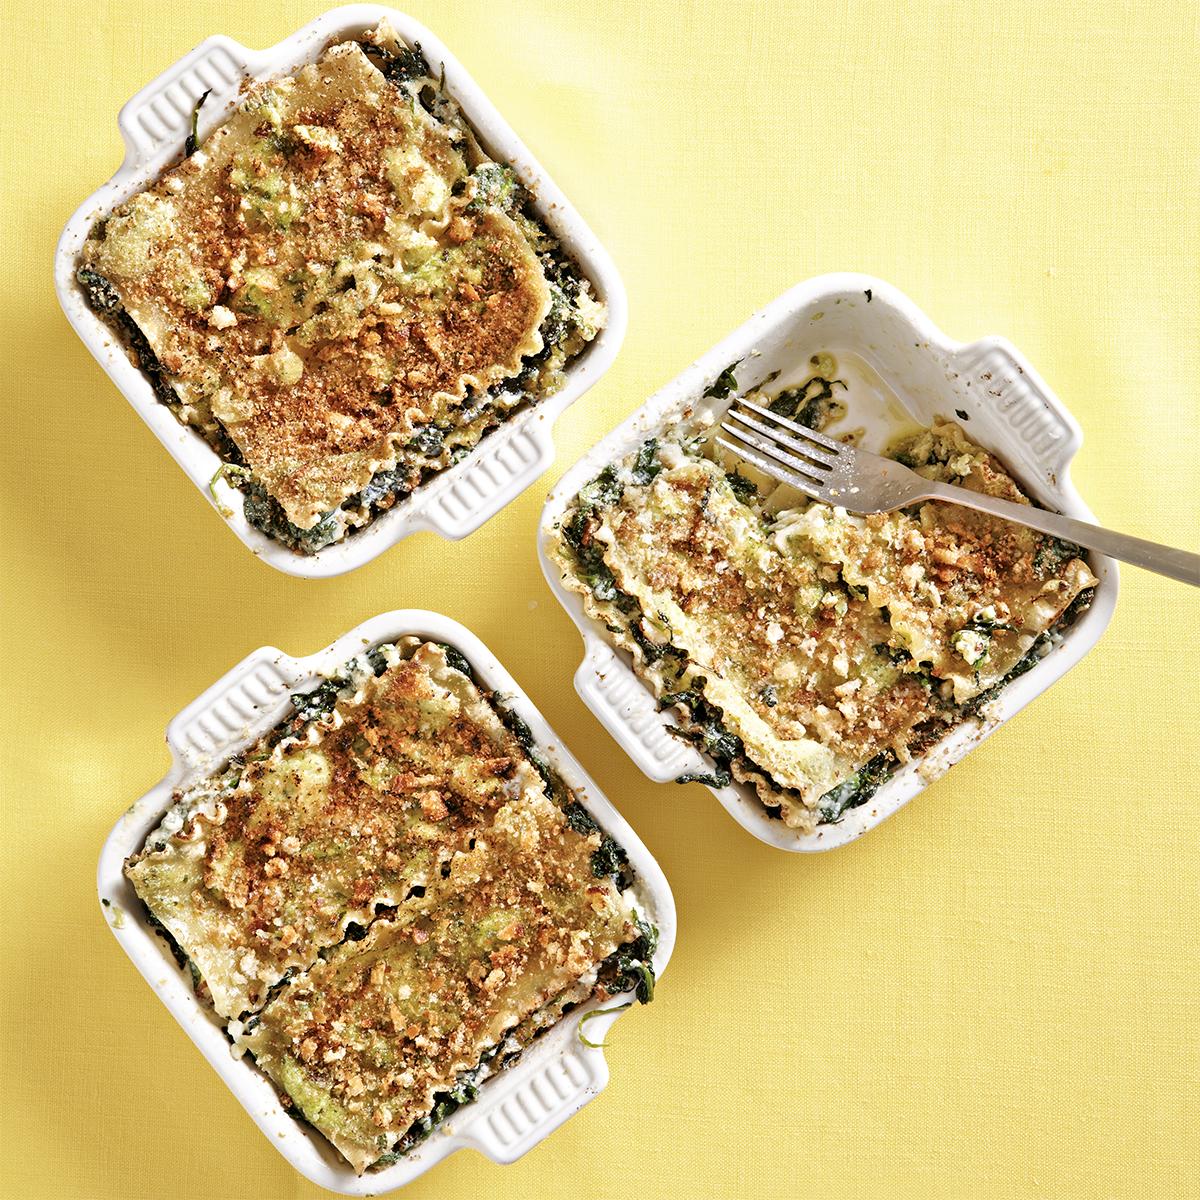 Spinach & Pesto Baked Lasagna